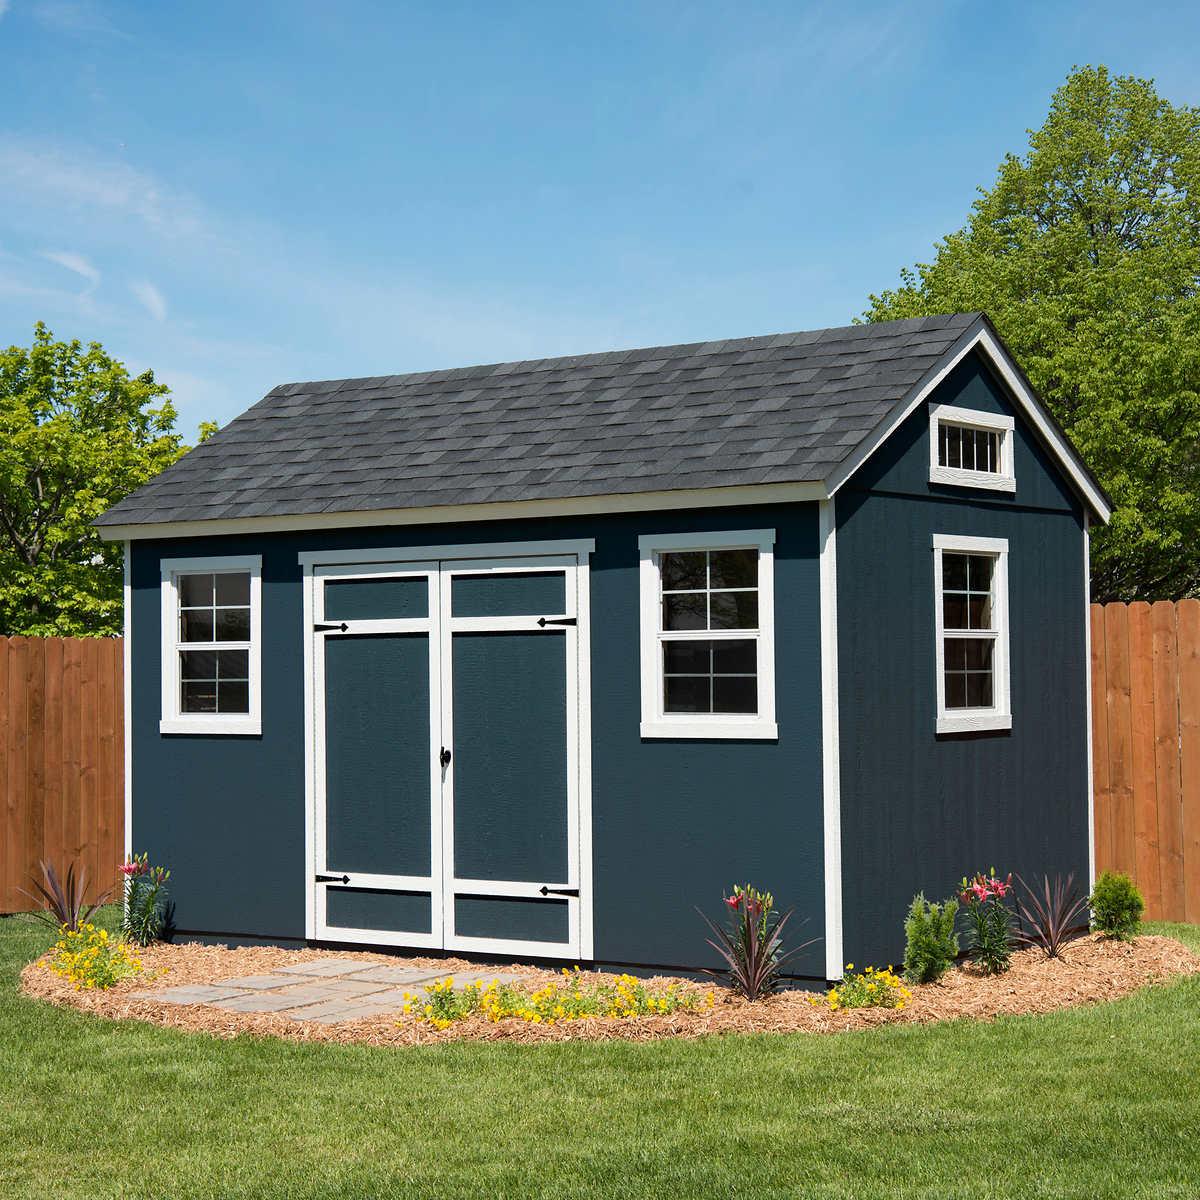 Berkdale 14 39 x 8 39 wood shed 918 cubic feet floor kit for Best deals on garden sheds